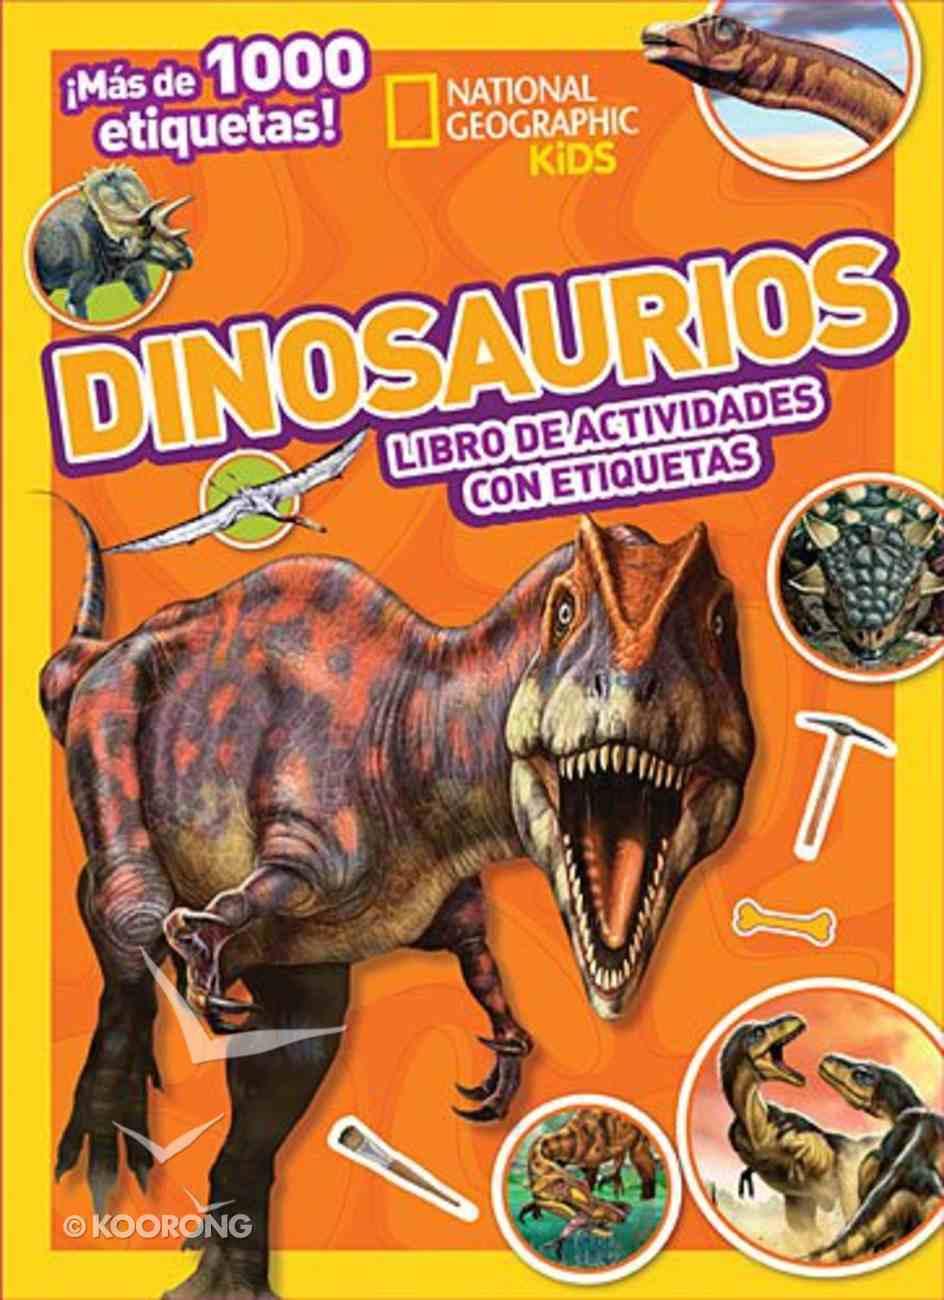 Dinosaurios (Dinosaurs Stickers Activity) Novelty Book